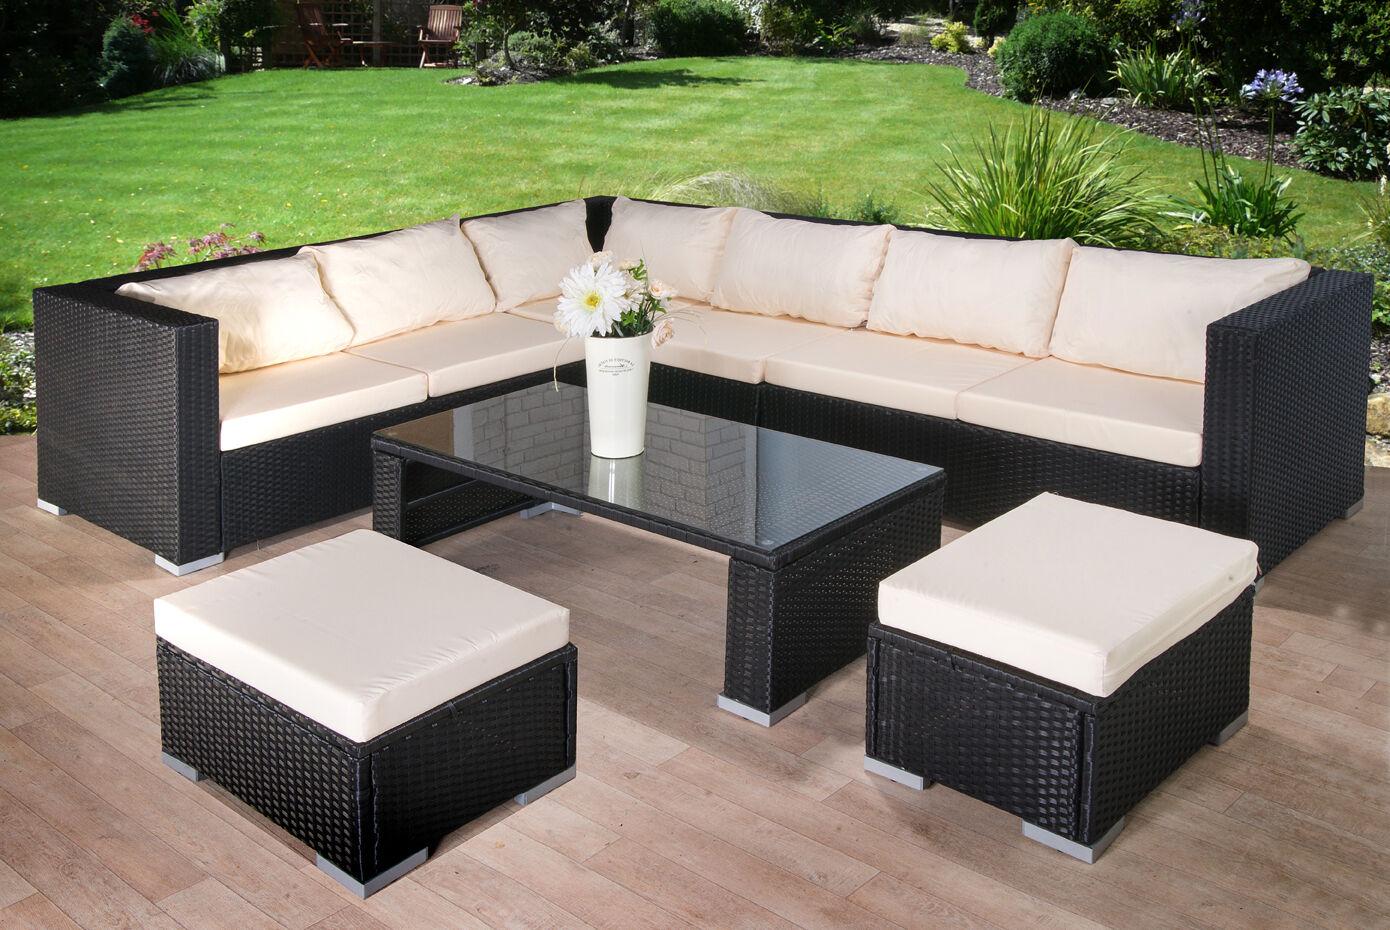 Garden Furniture - MODERN RATTAN GARDEN FURNITURE SOFA SET LOUNGER 8 SEATER OUTDOOR PATIO FURNITURE